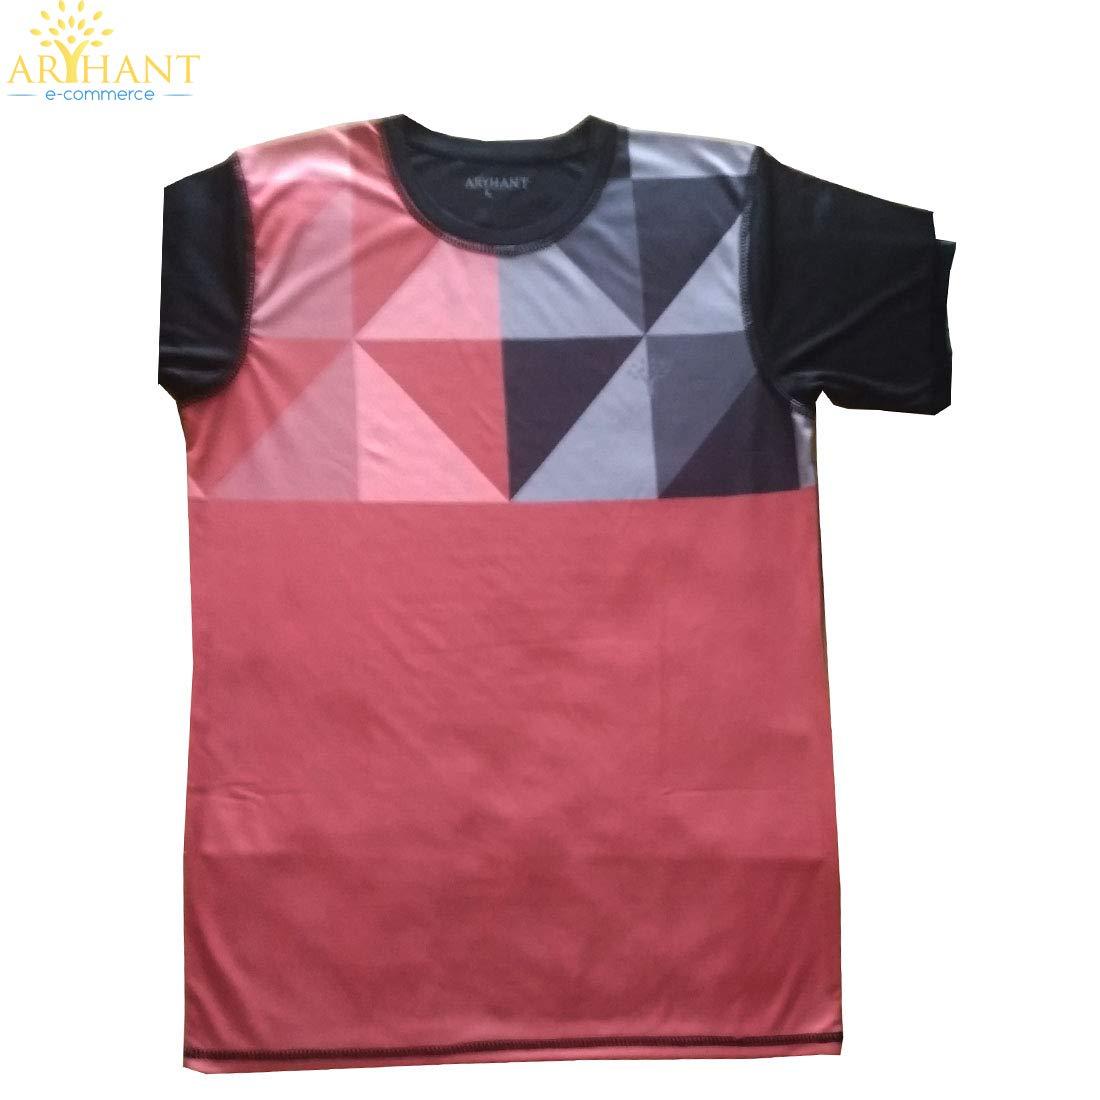 34b9a458 Arihant Ecommerce Digital Printed Round Neck T-Shirt Men Women   Best Gift  Brother & Sister   Half Sleeve T-Shirt  Round Neck T Shirt  Digital Printed  ...